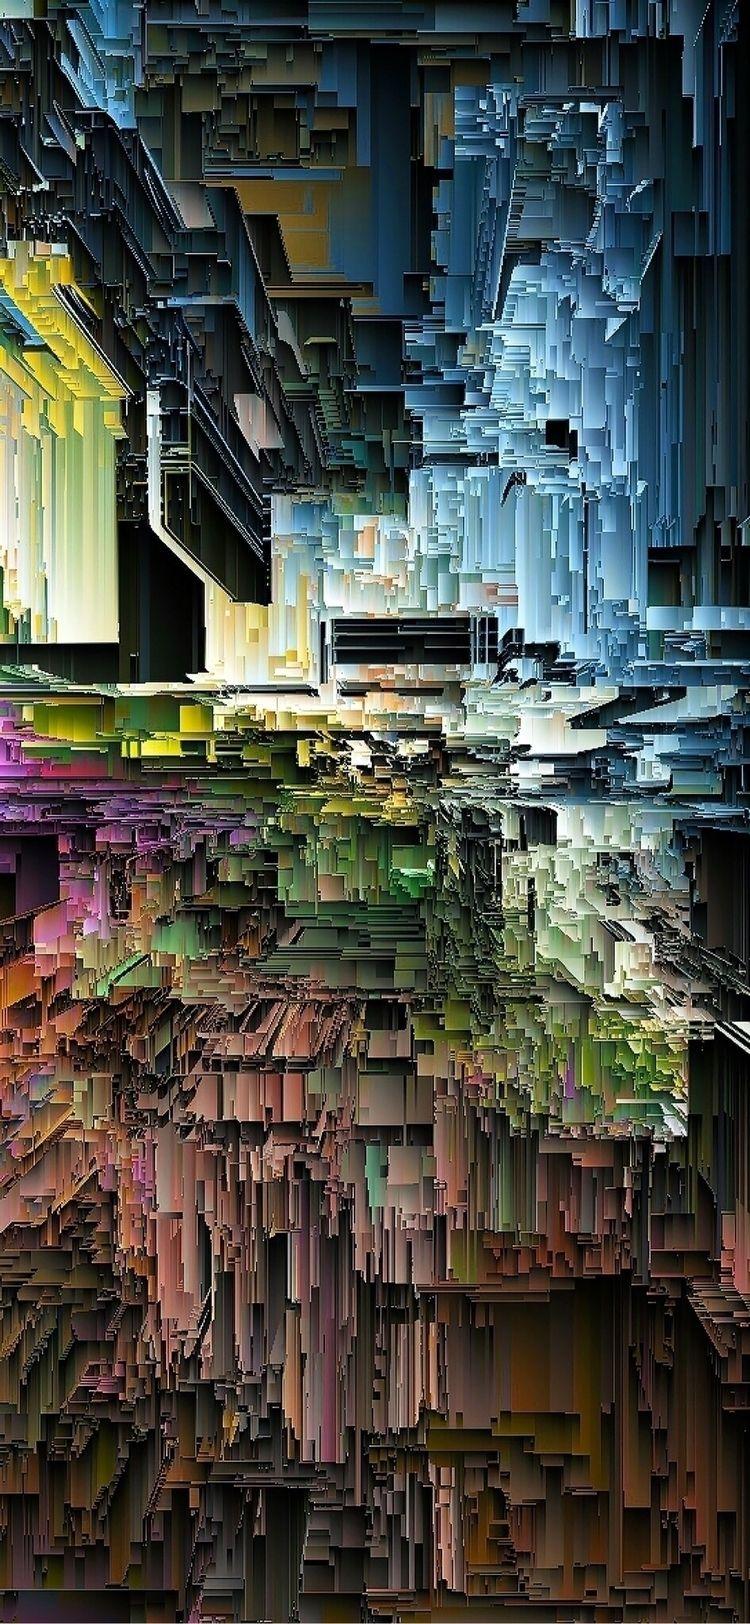 ◱ noisiVision  - noise, vision, pixelart - ikatch | ello